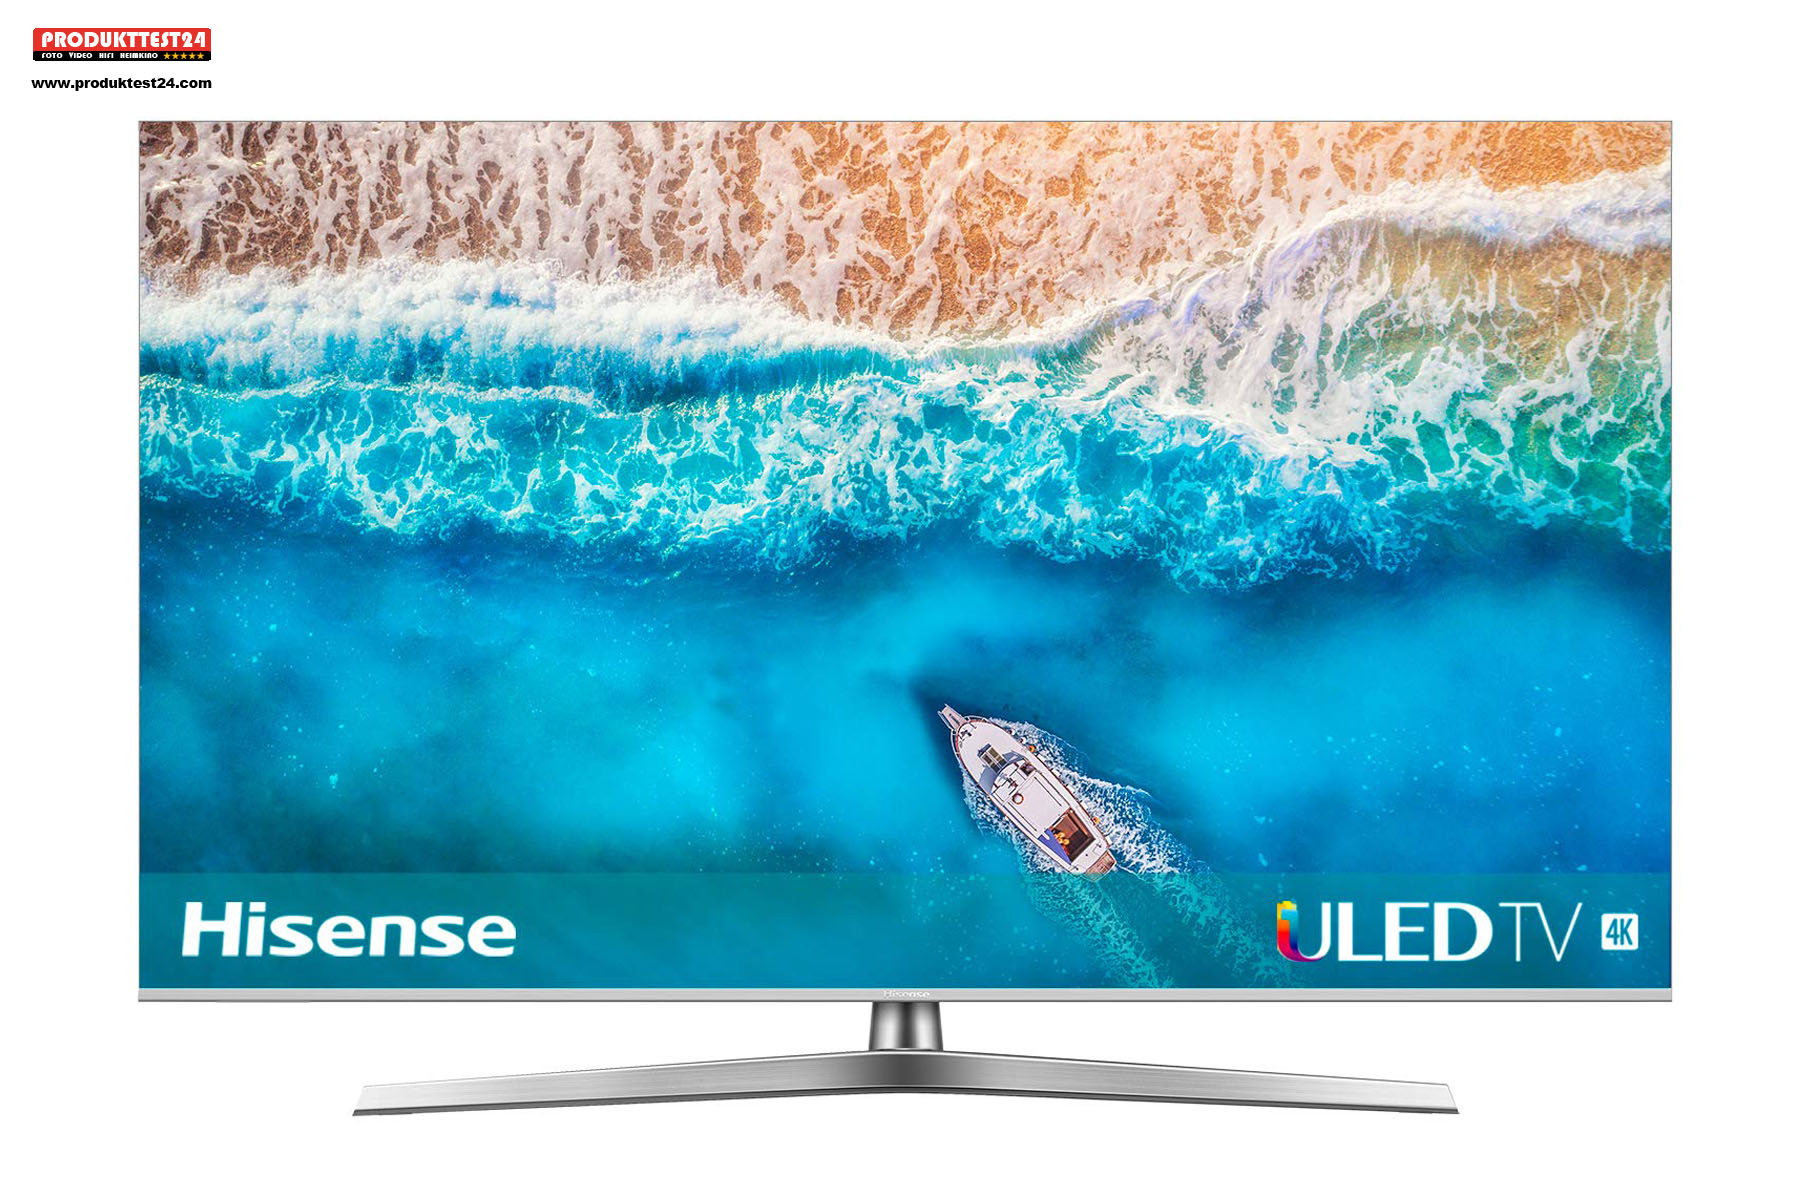 Hisense H65U7B ULED 4K Fernseher mit HDR10+, Dolby Vision und Dolby Atmos Sound